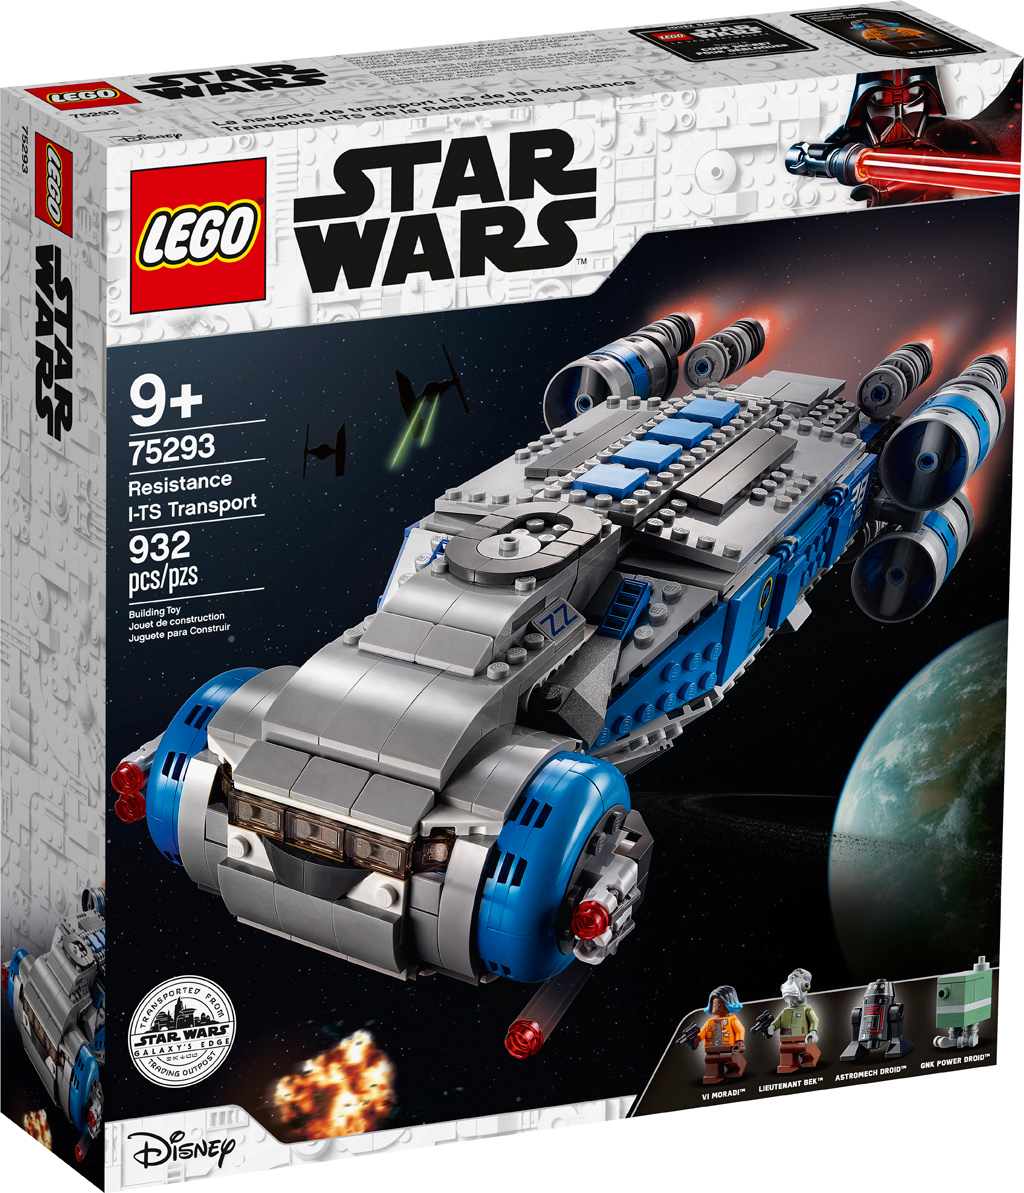 lego-star-wars-75293-resistance-i-ts-transport-2020-box zusammengebaut.com